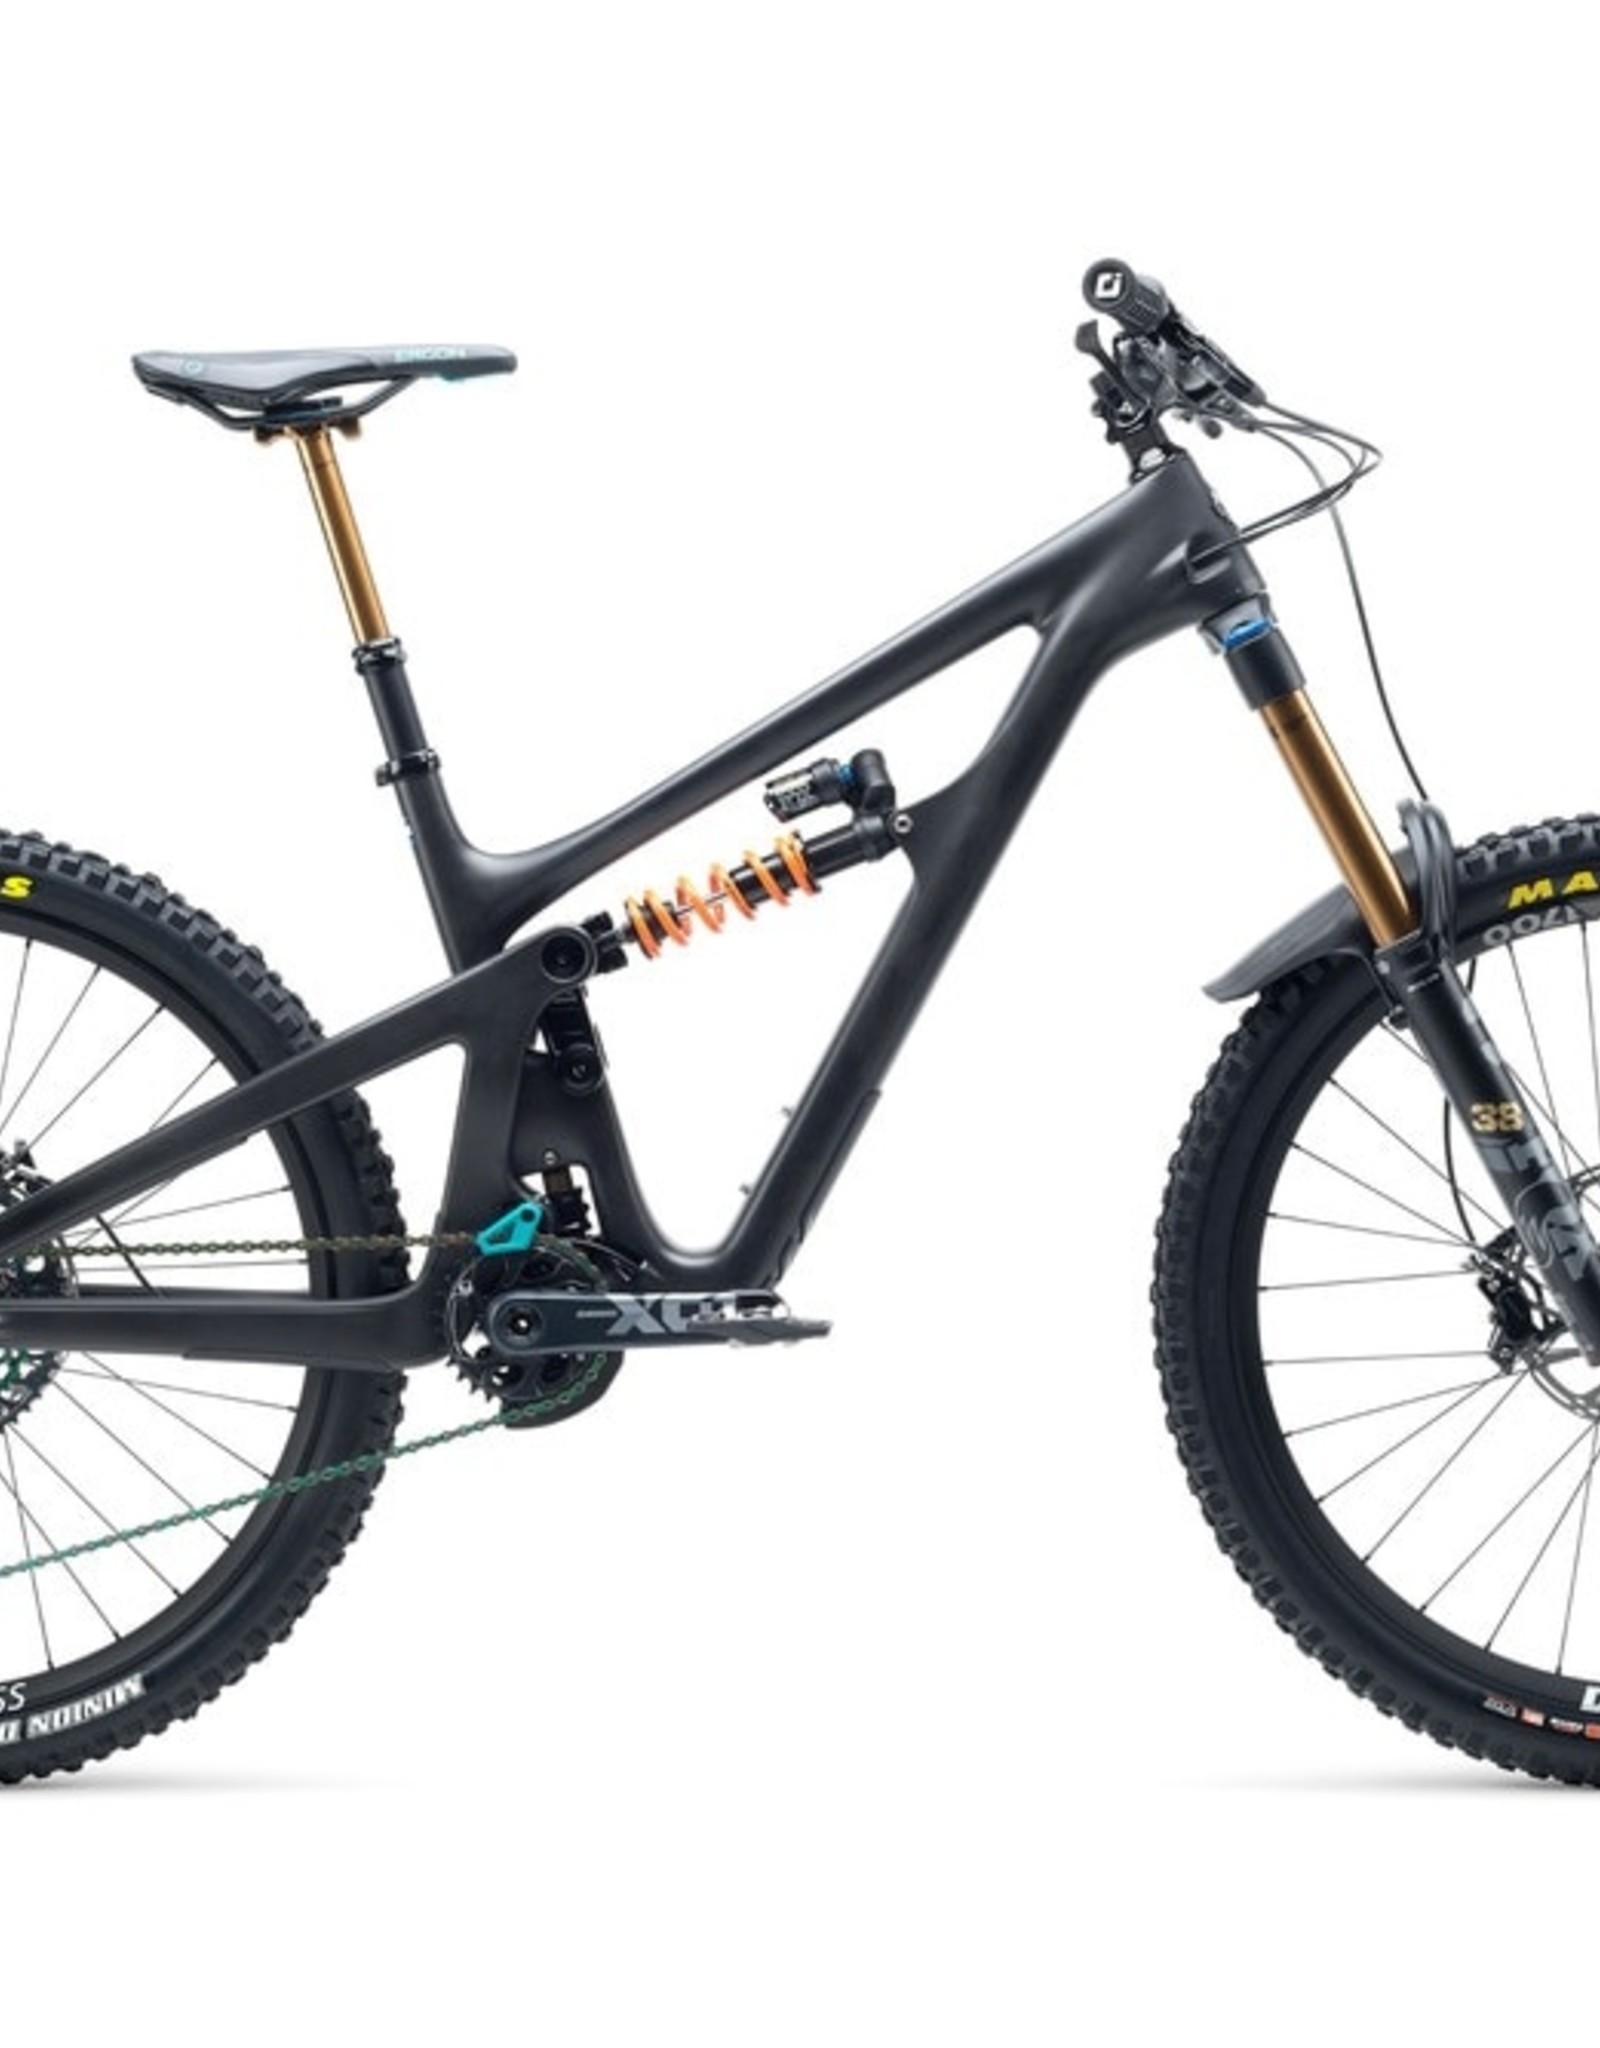 Yeti Cycles SB165 T-SERIES